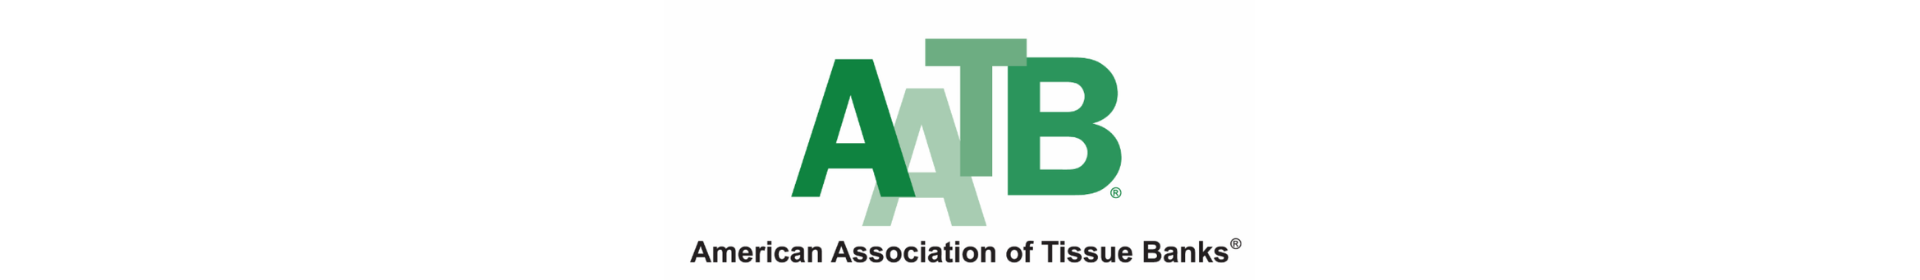 2019 AATB Awards Event Banner